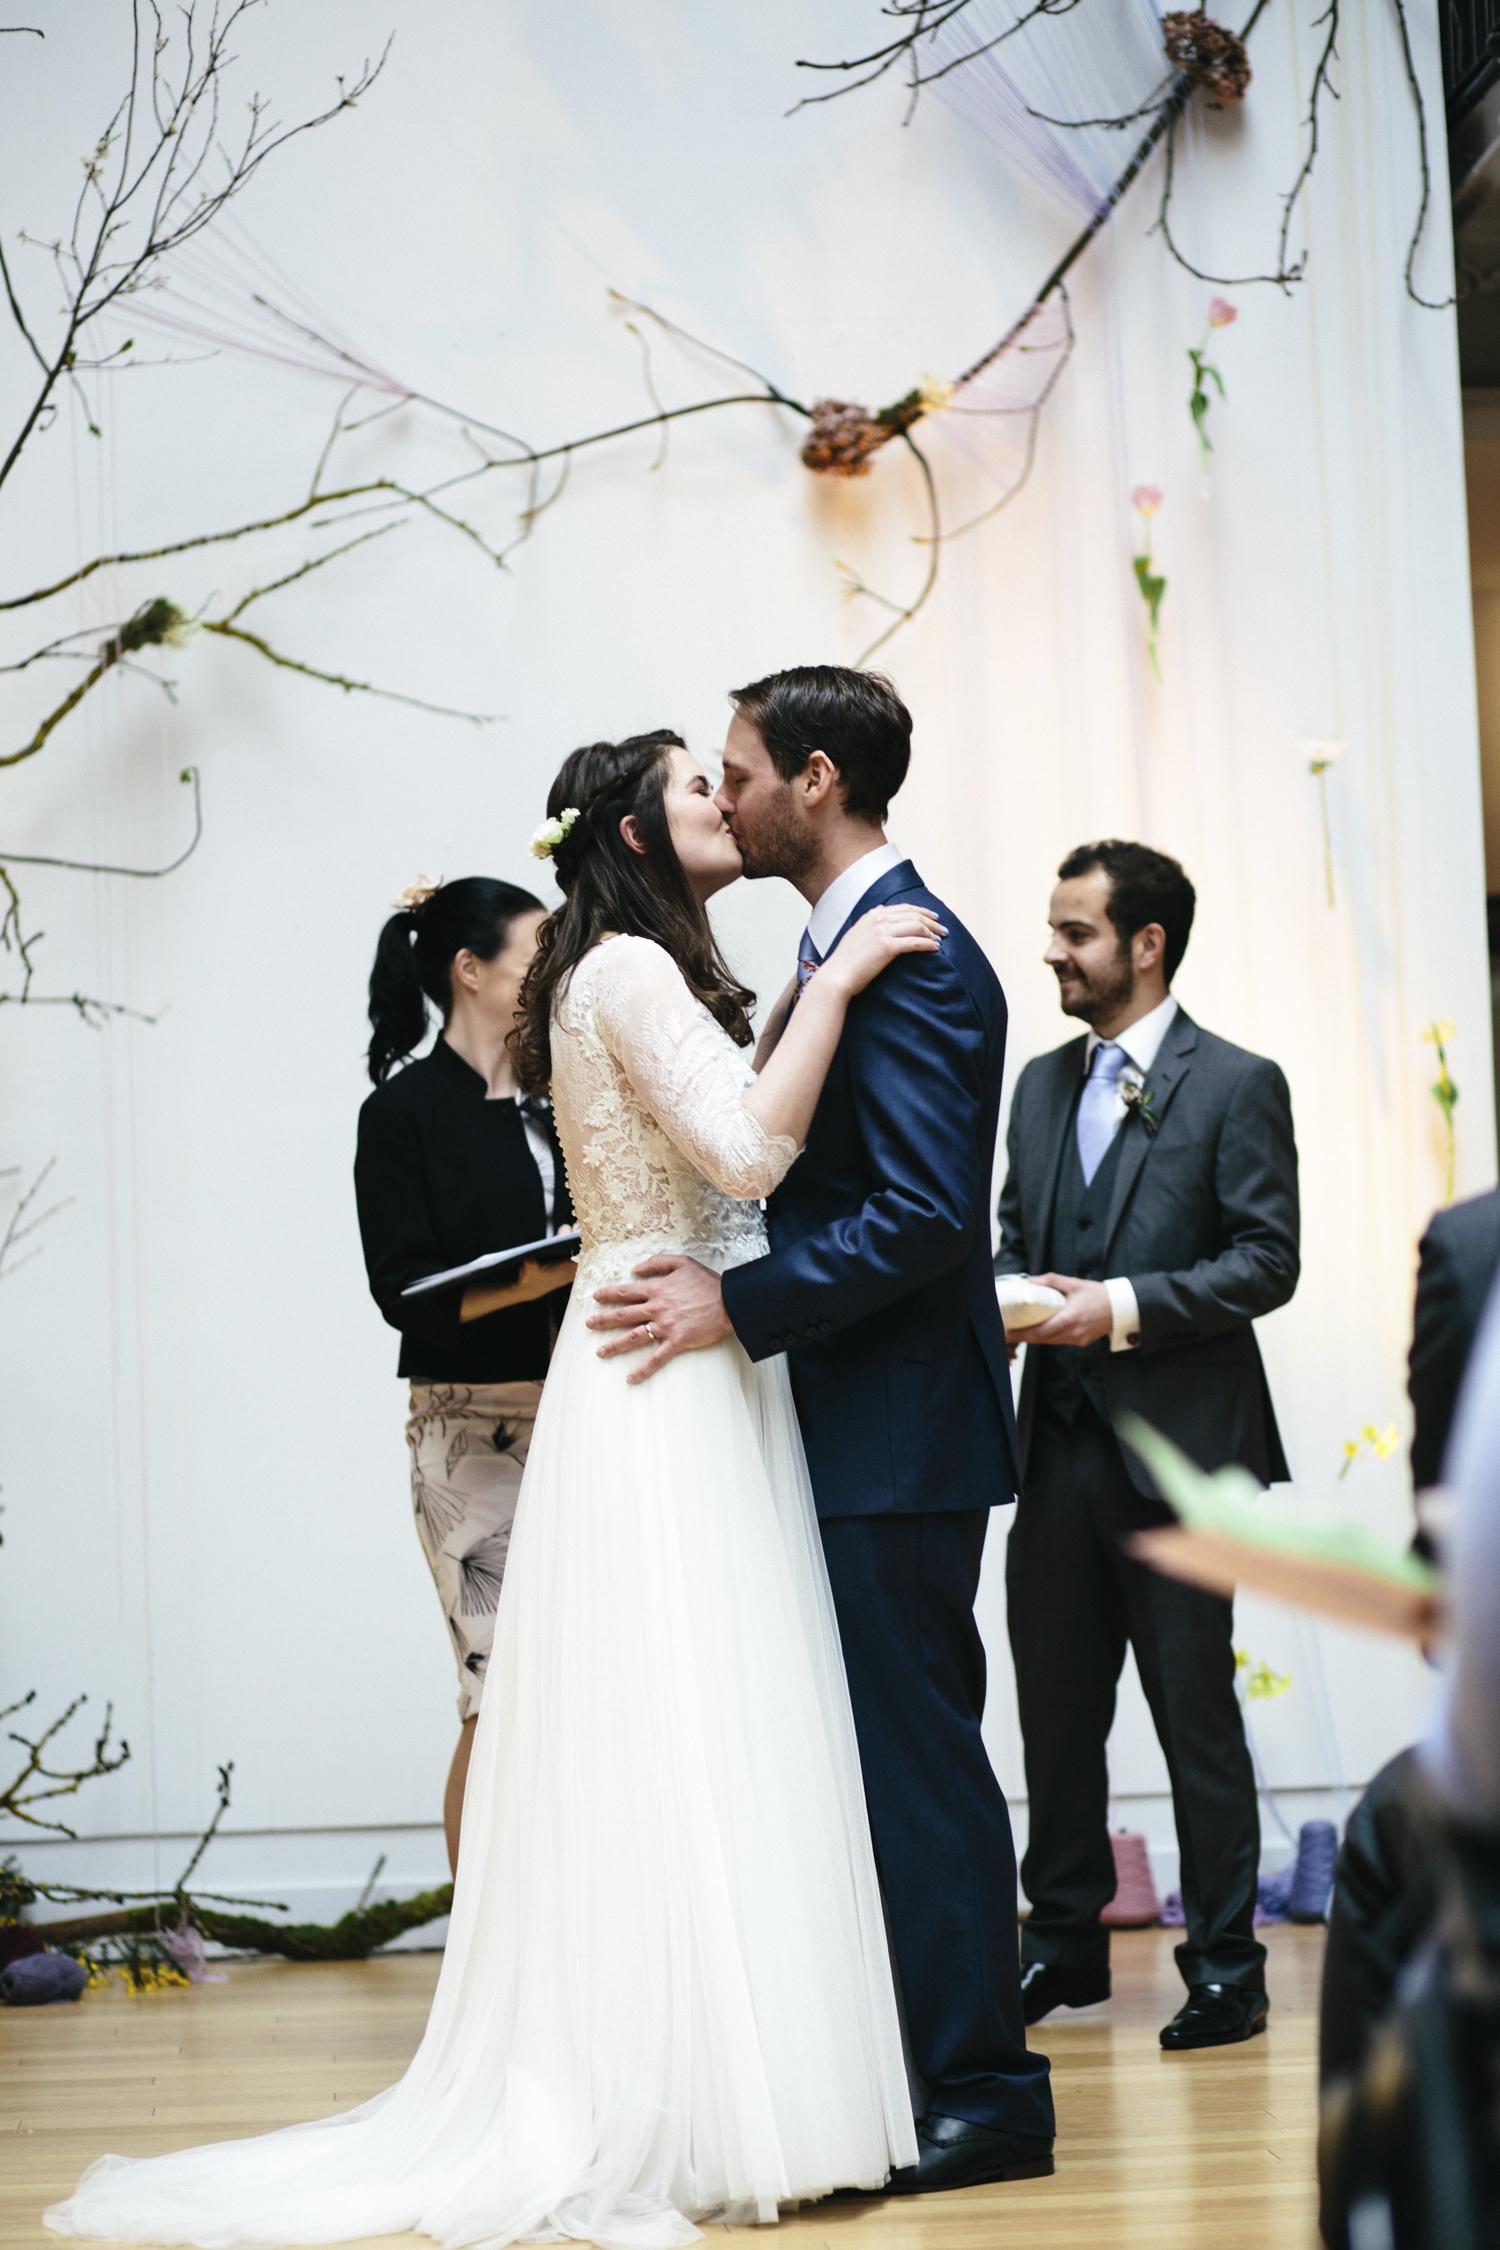 Quirky Wedding Photography Edinburgh Dovecot Studios 057.jpg